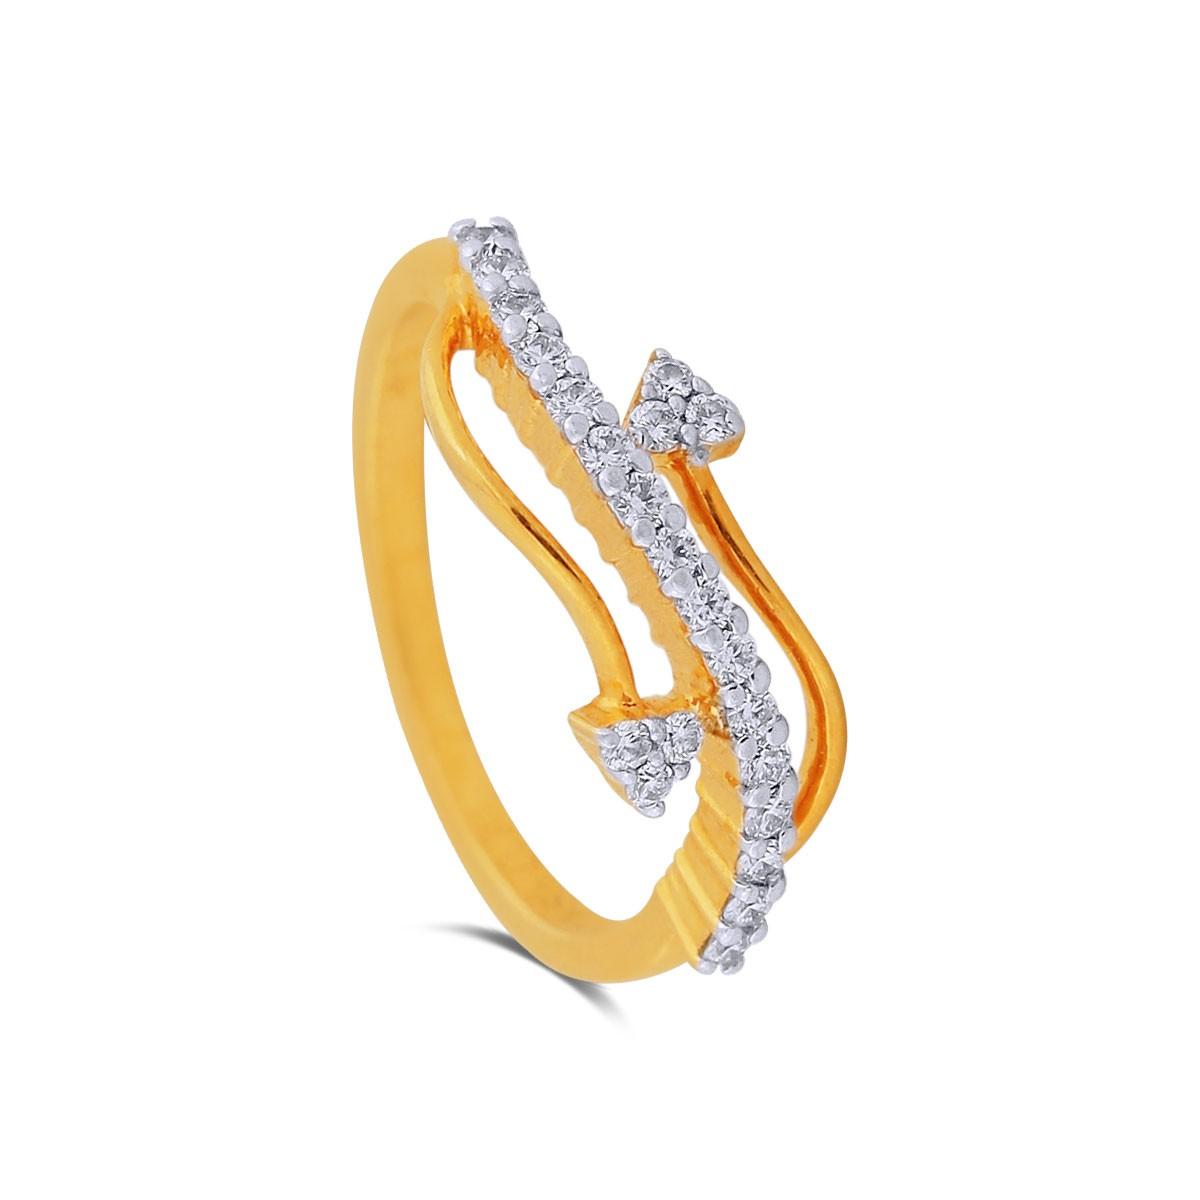 Neri Yellow Gold Diamond Ring